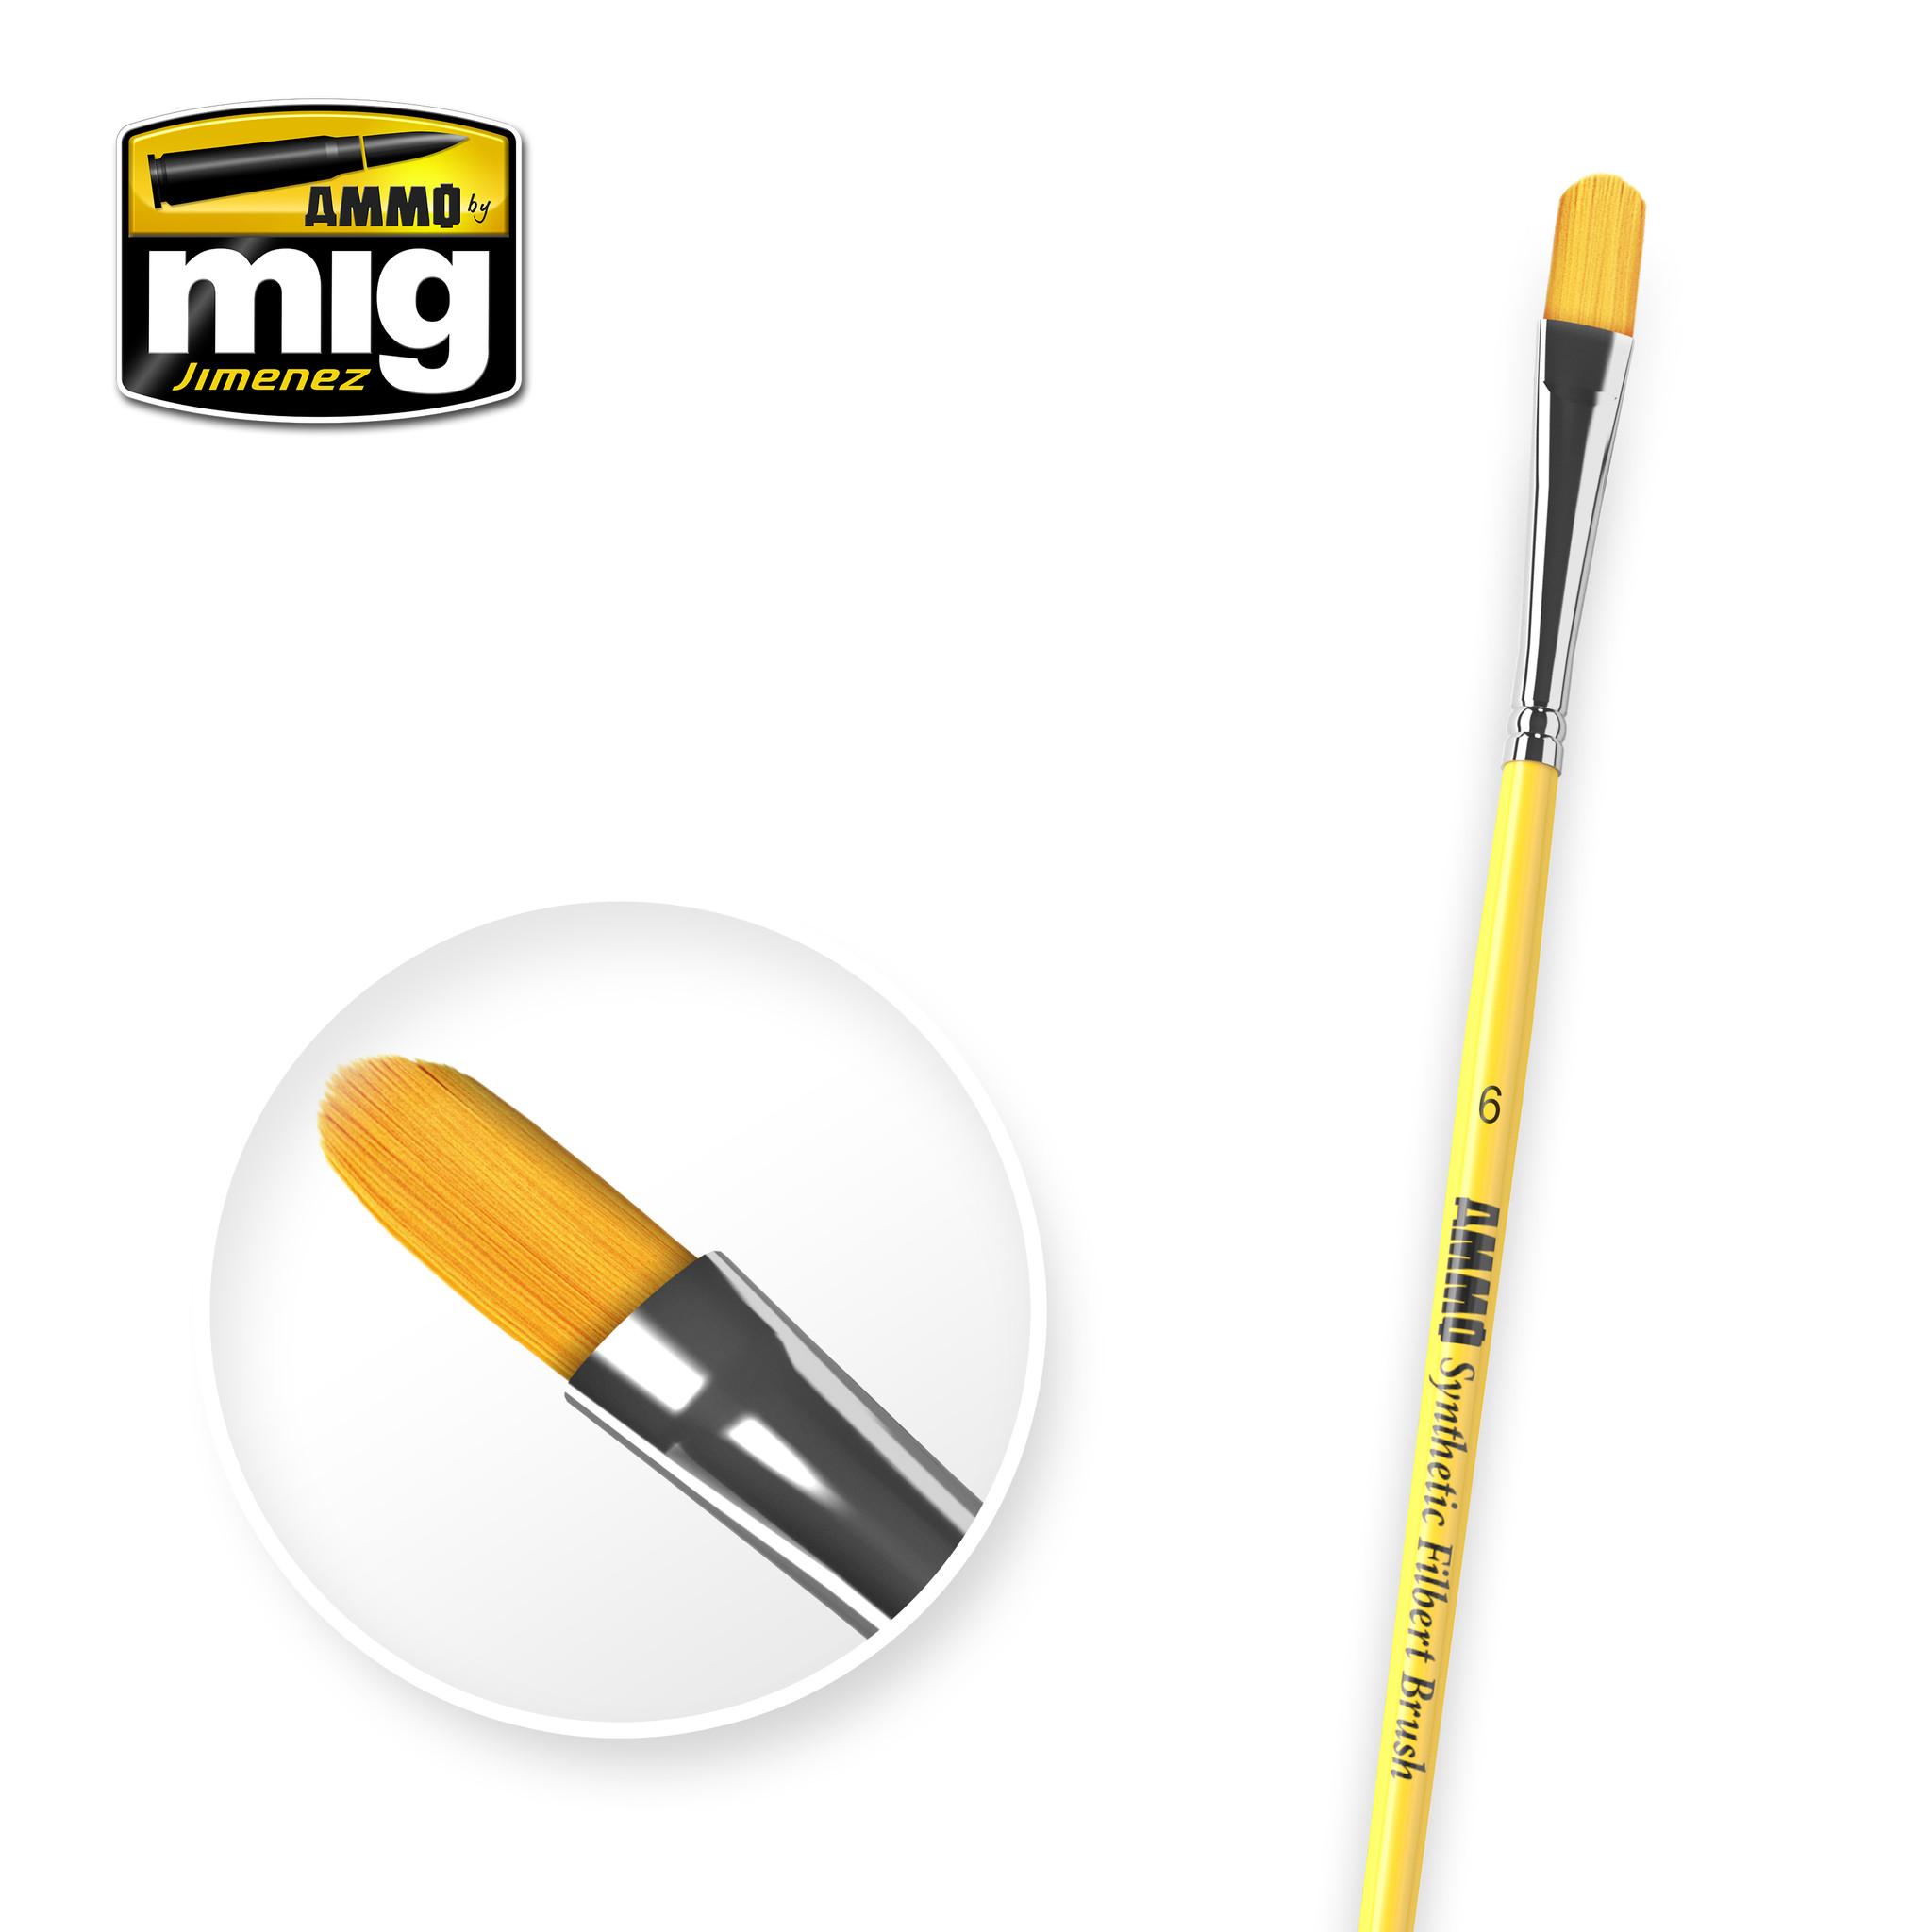 Ammo by Mig Jimenez 6 Syntetic Filbert Brush